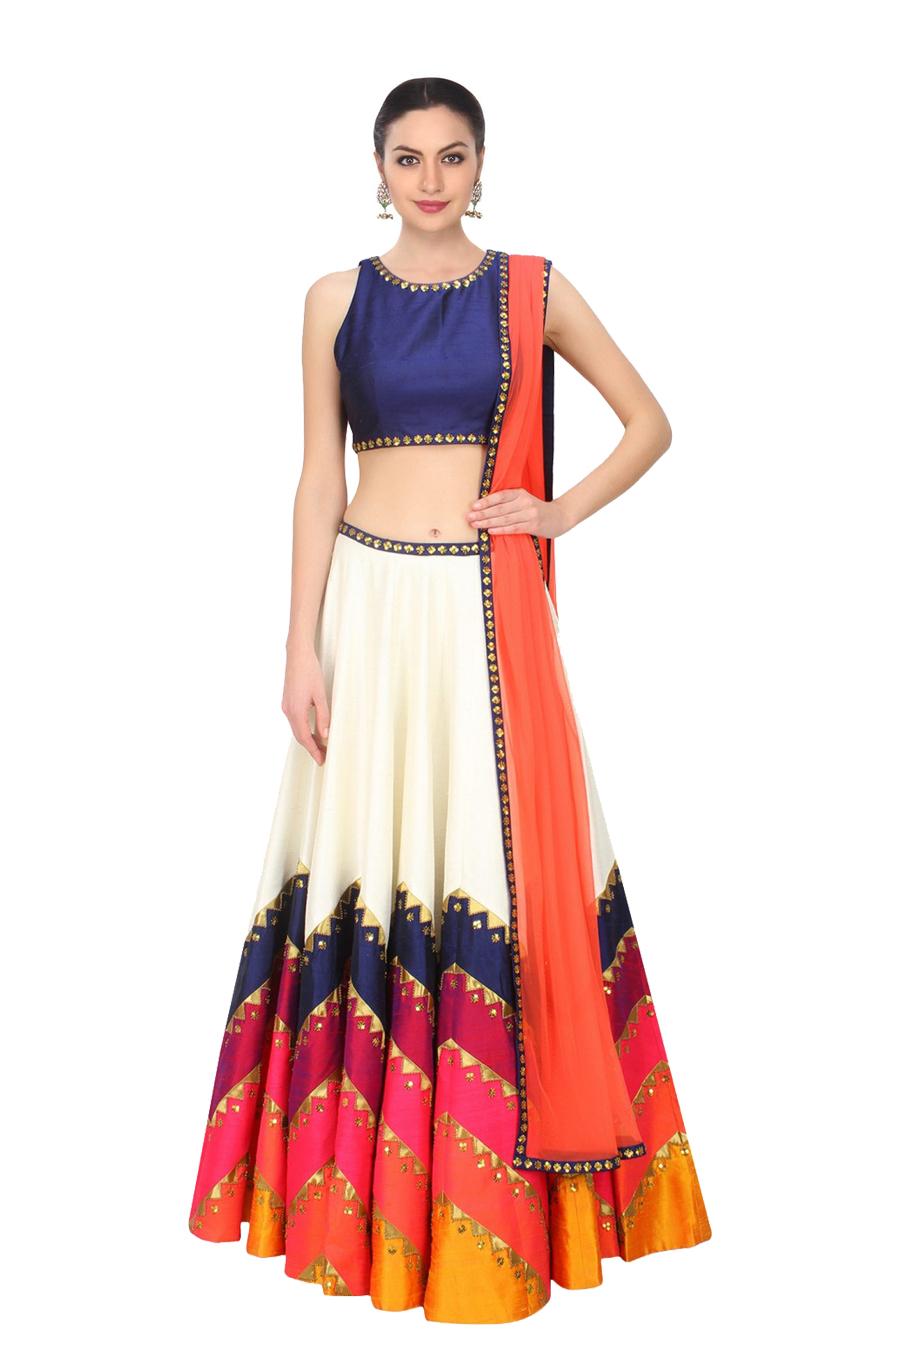 Indian Silk Women New Designer Skirt Lengha Printed Party Wedding Lehenga Choli Other Women's Clothing